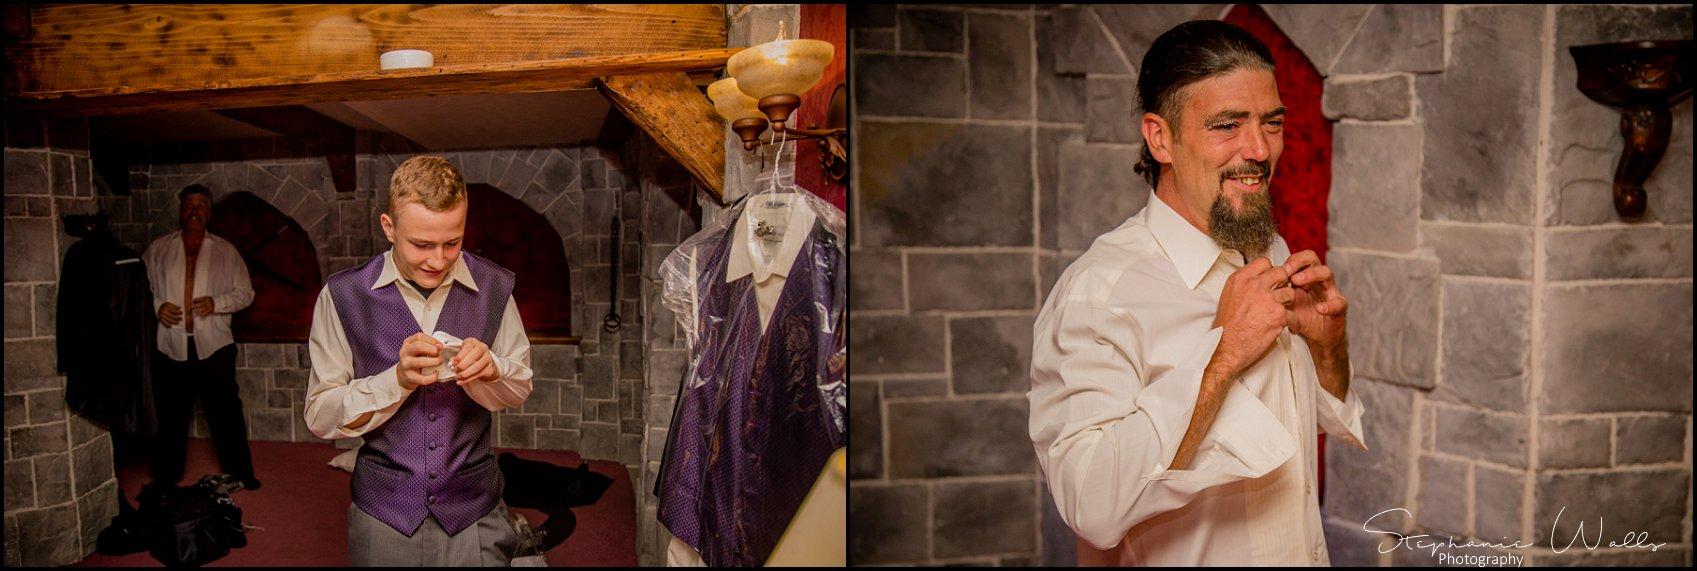 Everist Wedding 002 1 Patti & Bobbys | Troll Haven Castle & Bandy Farms | Sequim, Wa Wedding Photographer